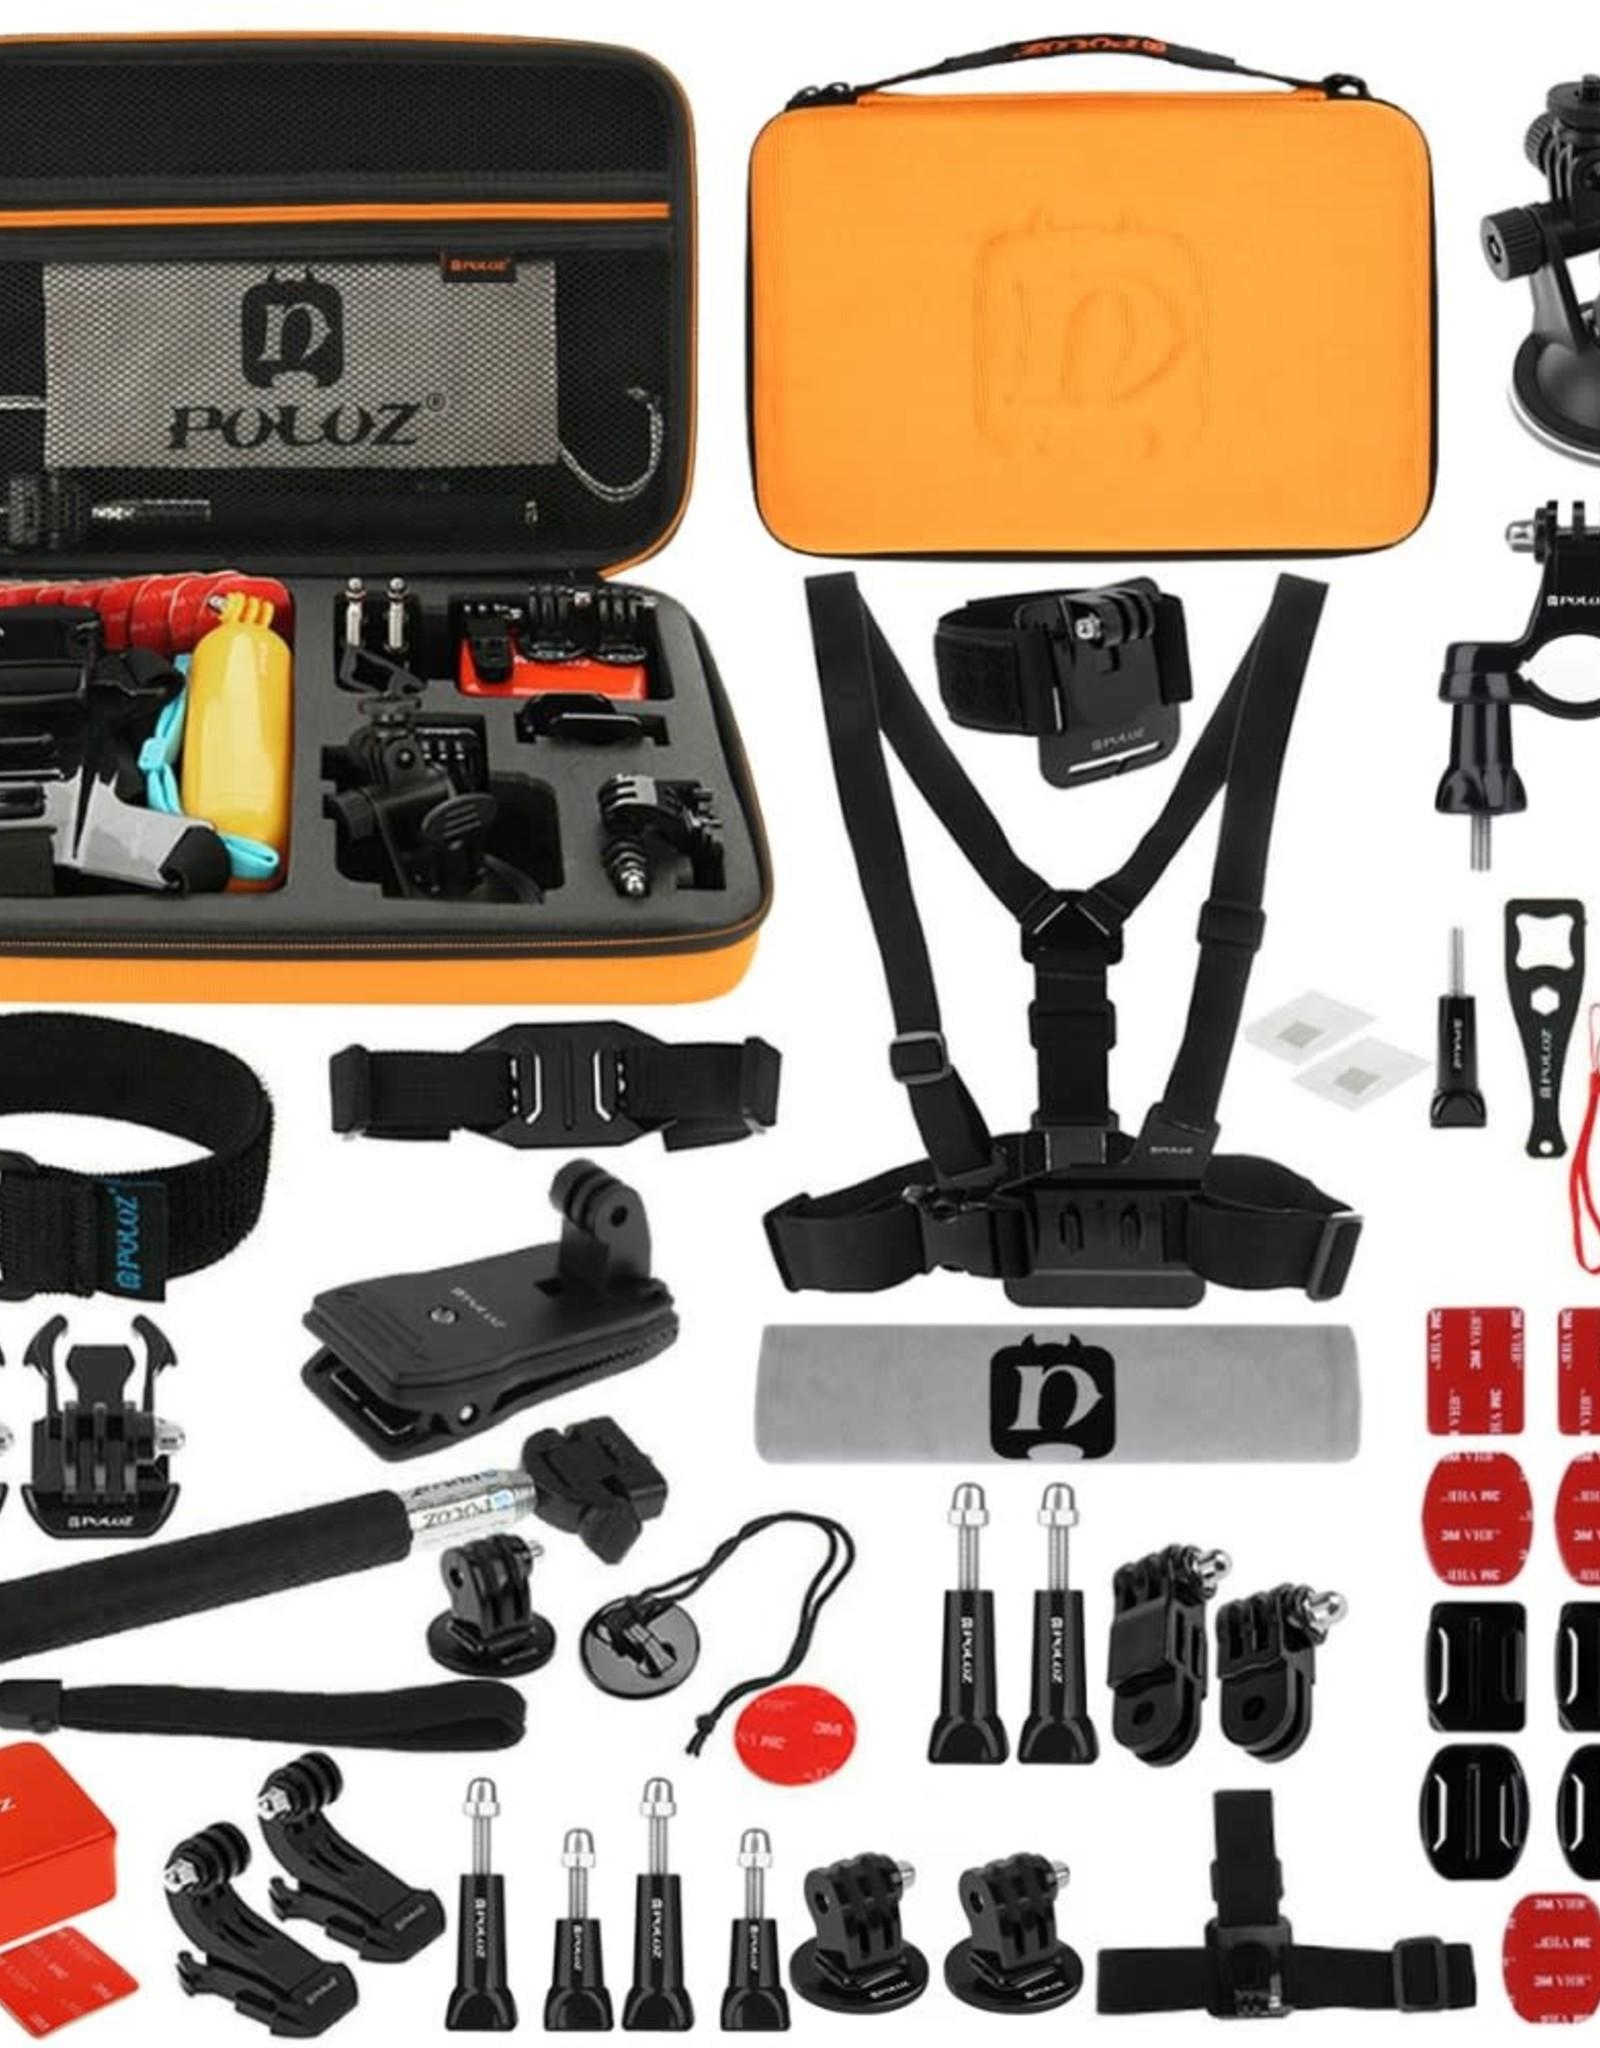 PULUZ PKT26 53 in 1 Portable Action Set Mount for DJI Action Cam | GoPro Hero 5 4/3+/3/2/1 SJ4000/5000/6000/Xiaomi Yi